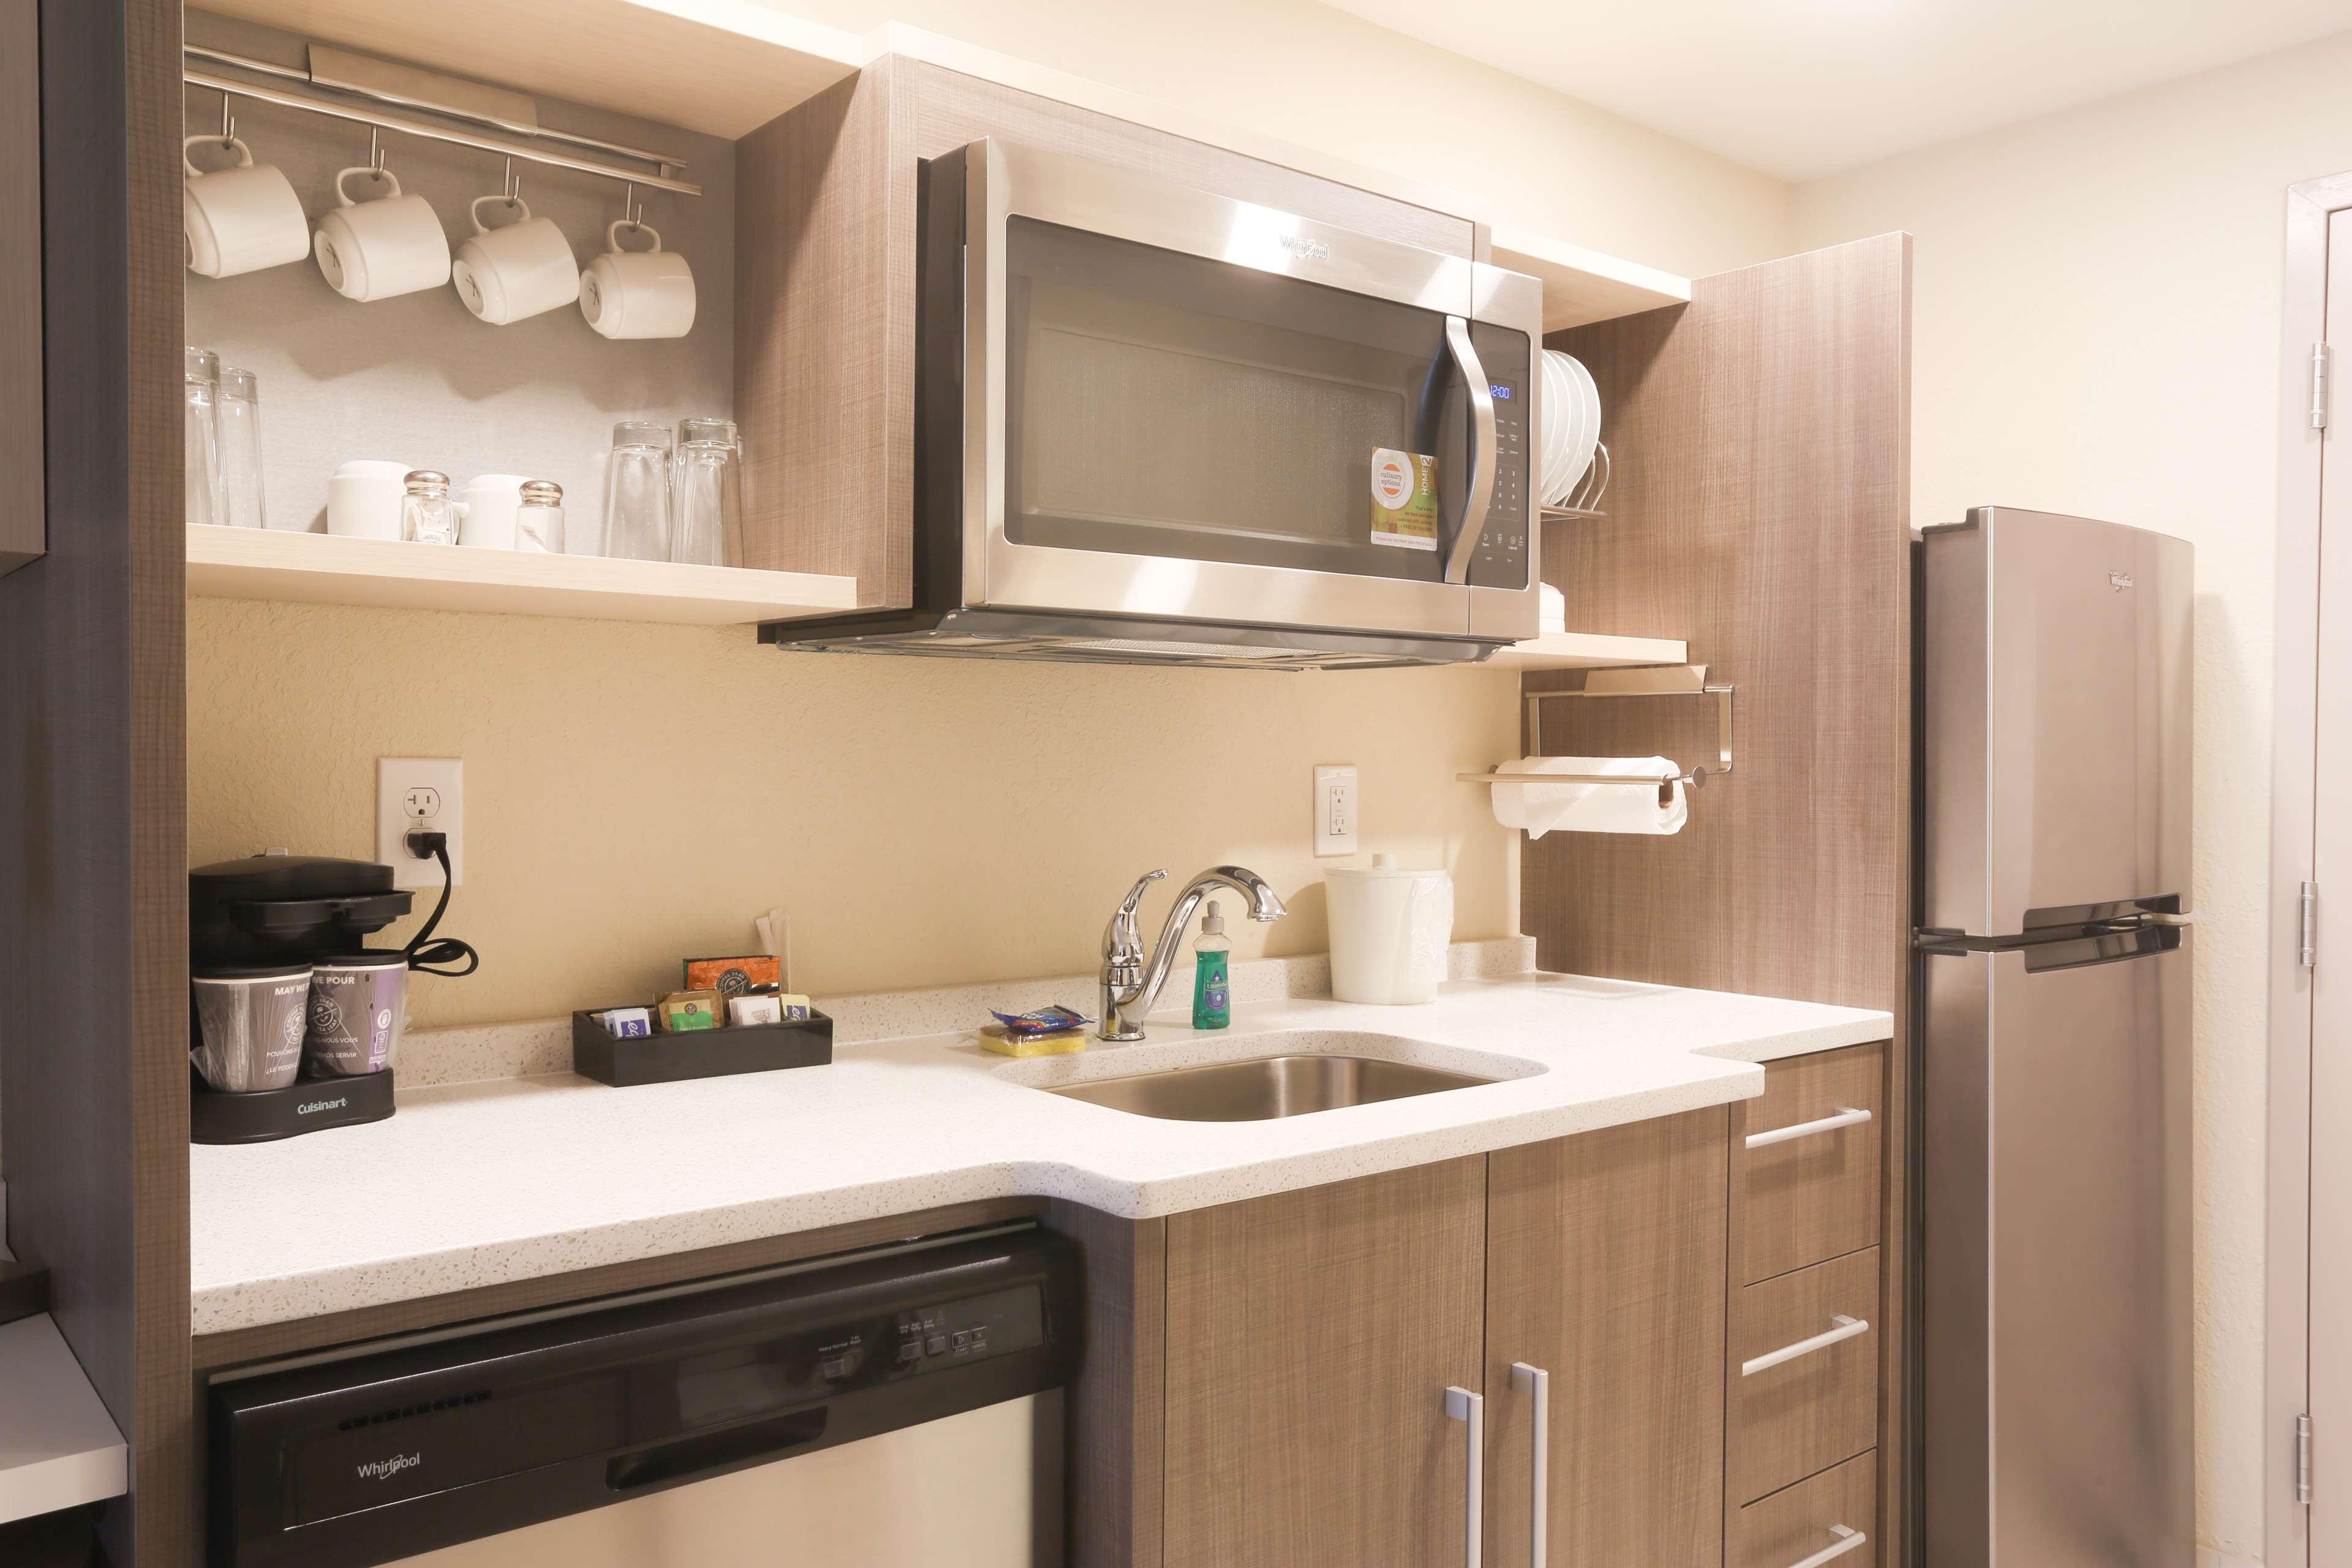 Home2 Suites by Hilton Bordentown image 30